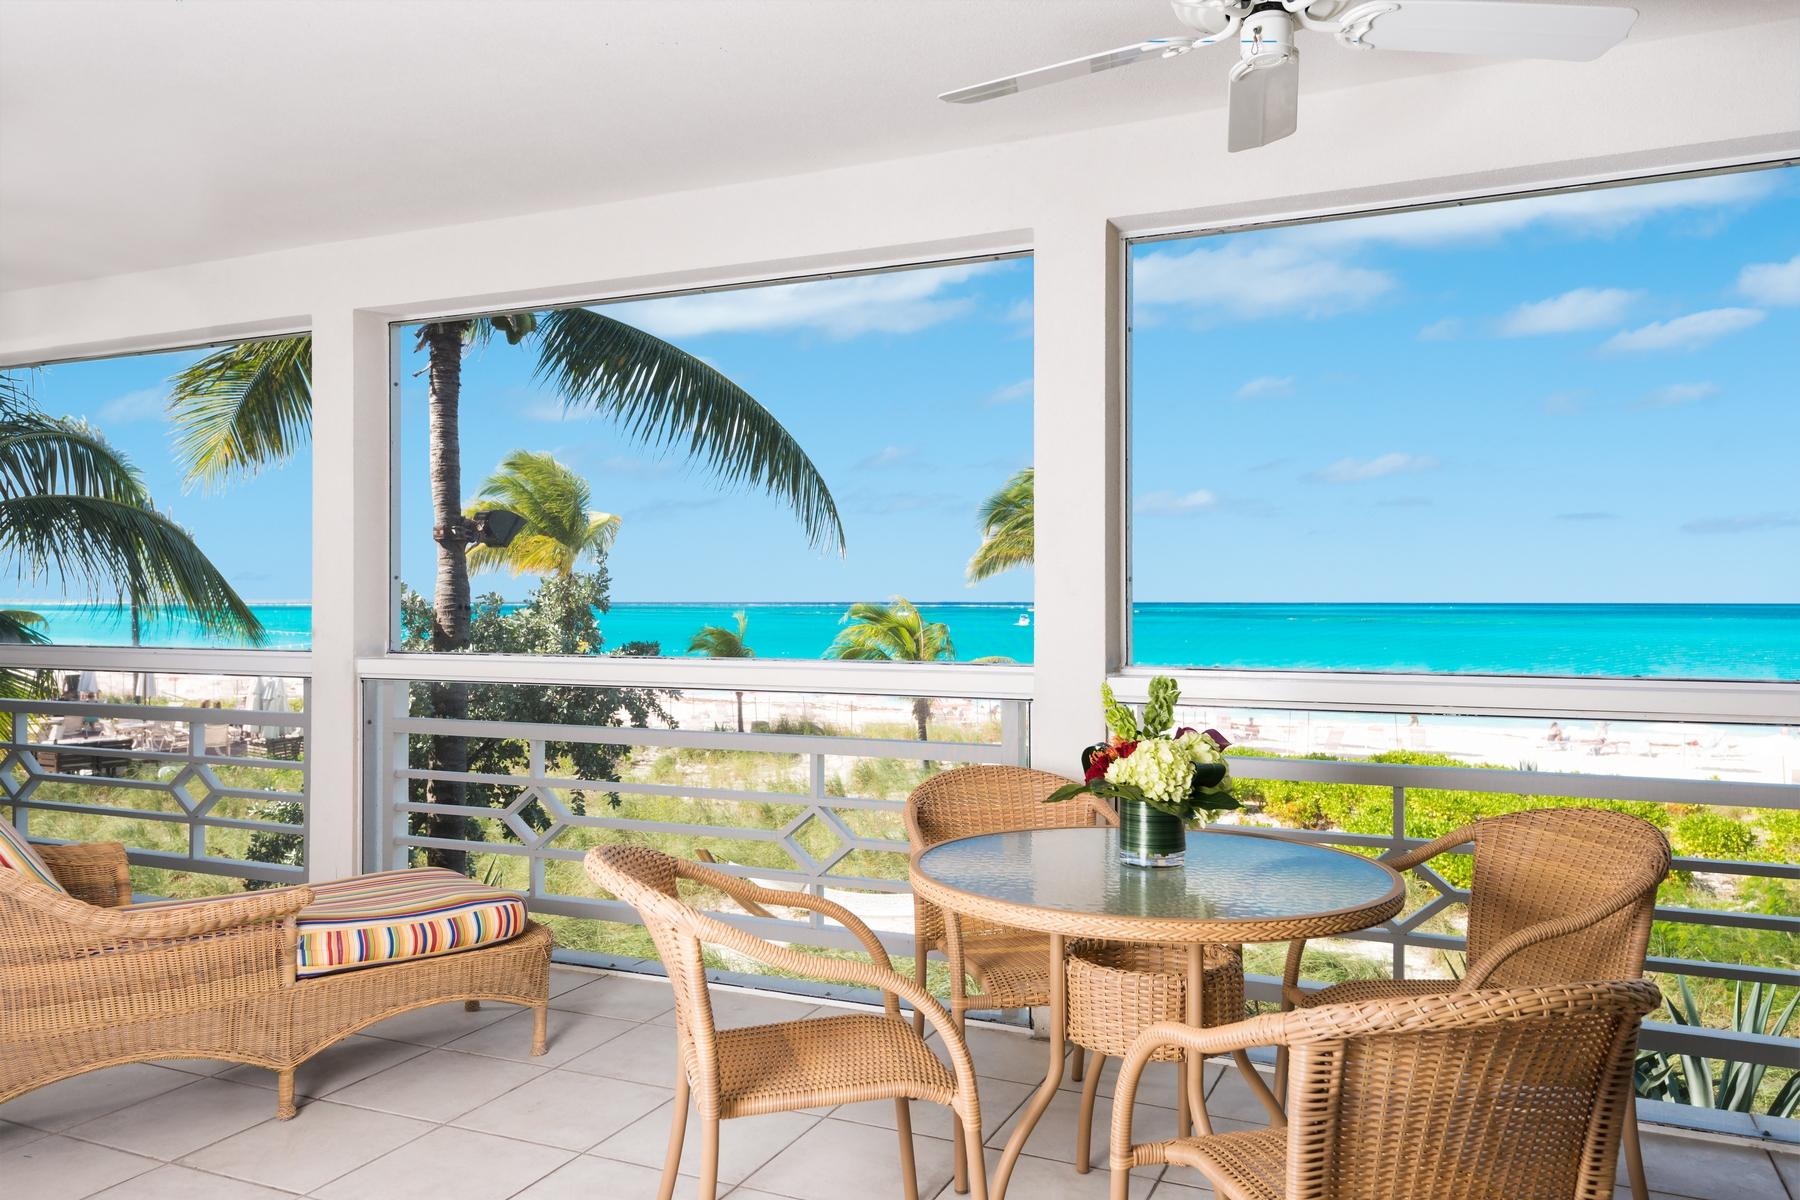 Condomínio para Venda às Ocean Club West - Suite 123 Oceanfront Grace Bay, Providenciales TCI Turks E Caicos